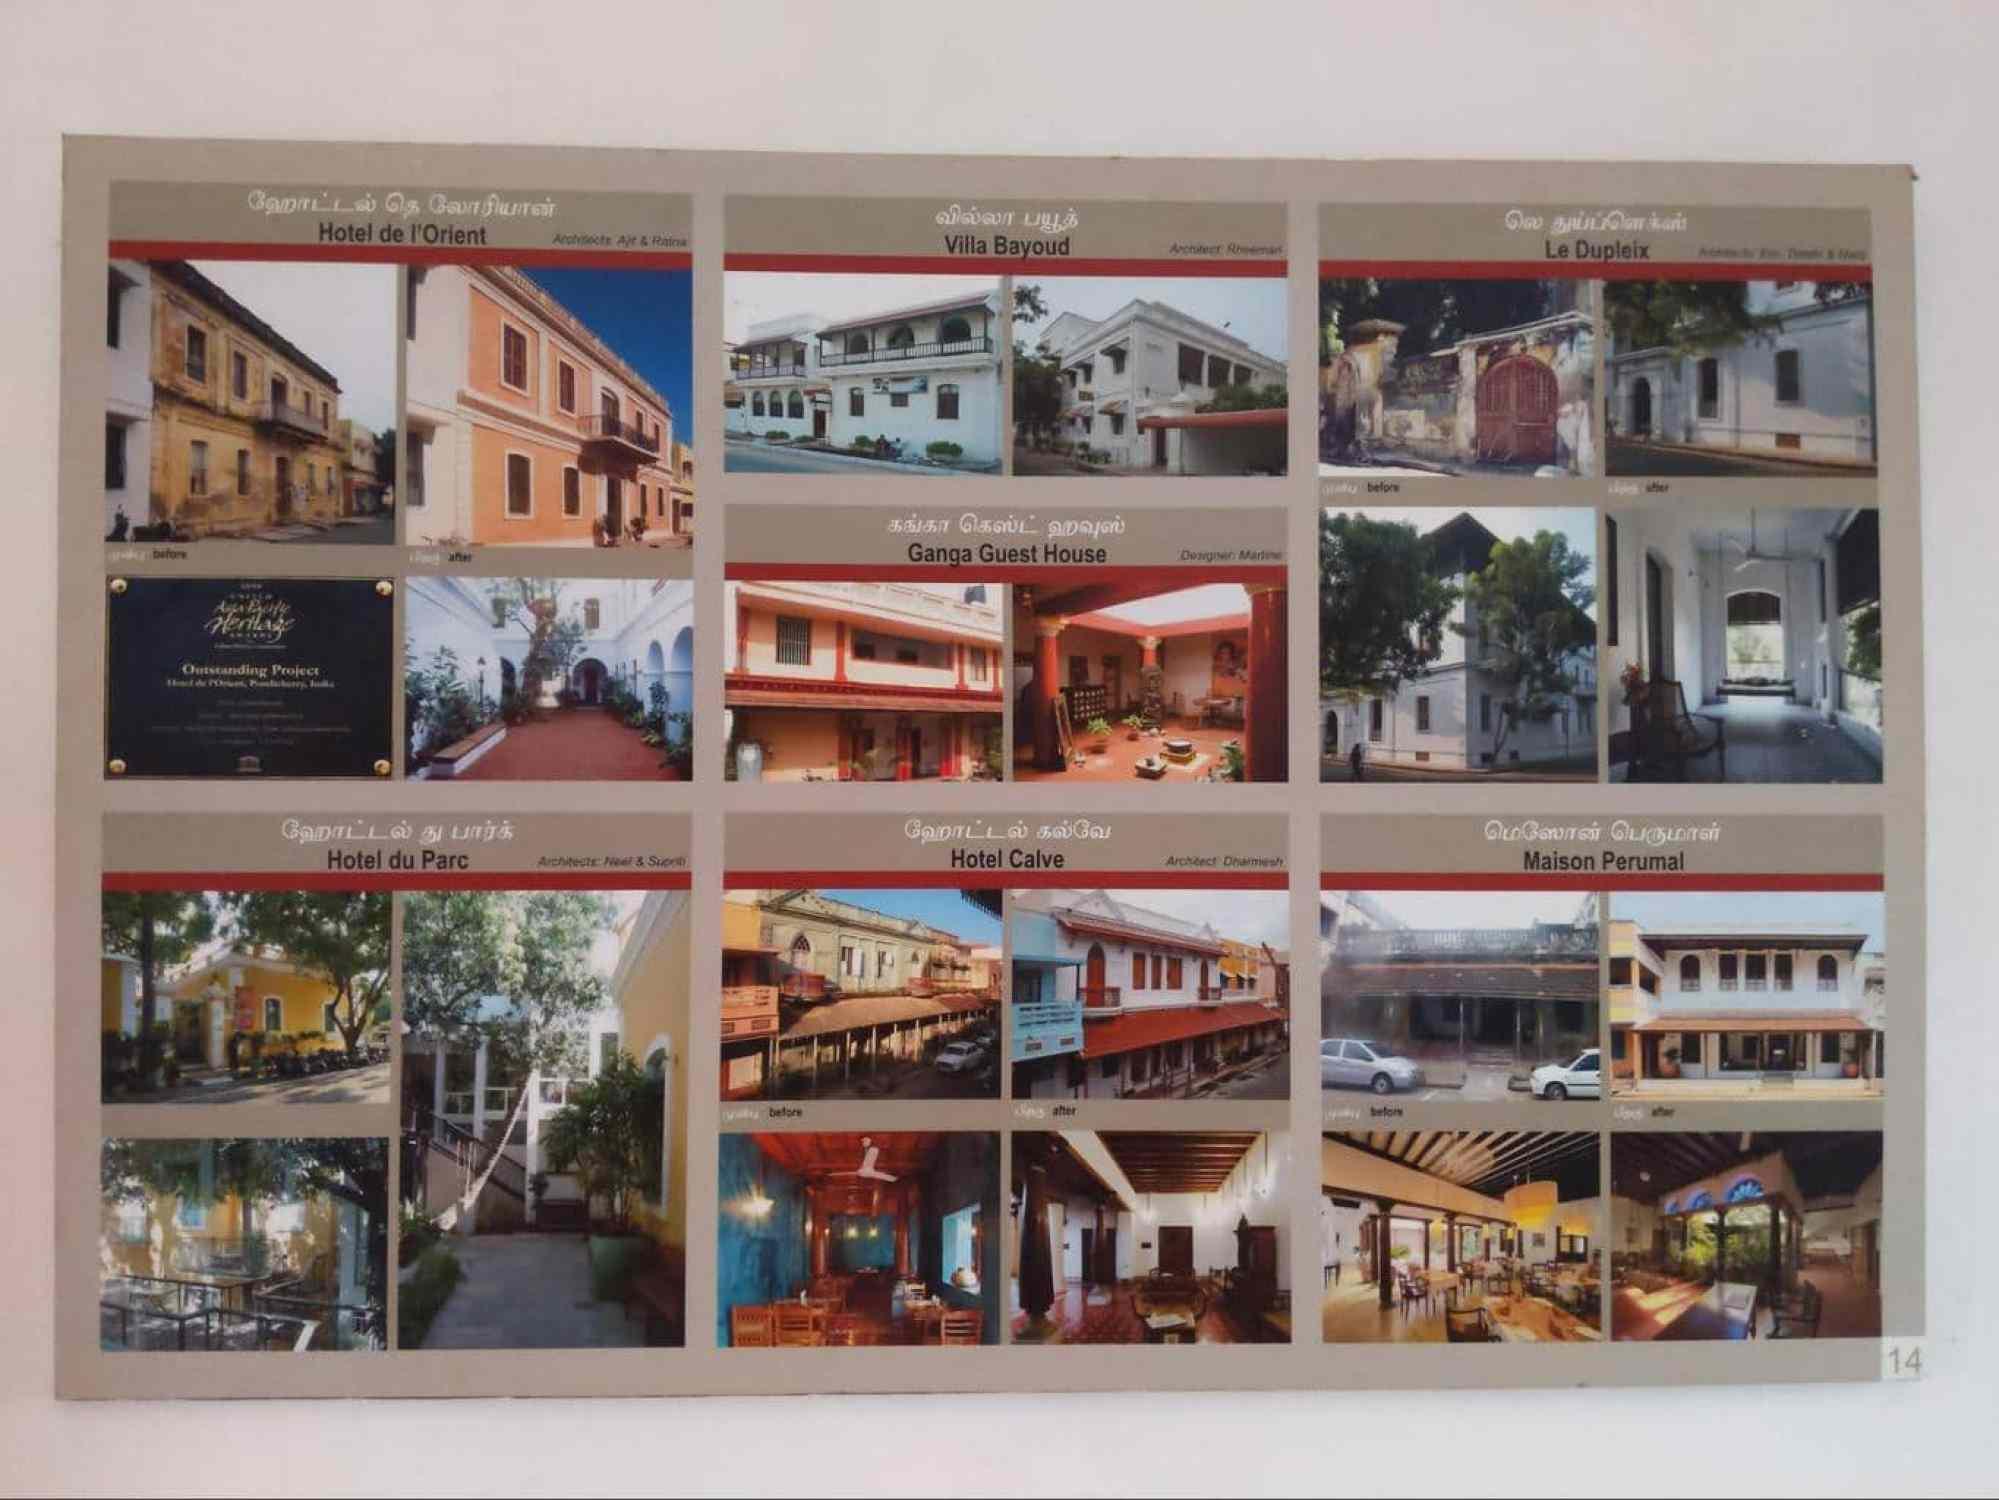 Documenting Pondicherry's heritage at INTACH